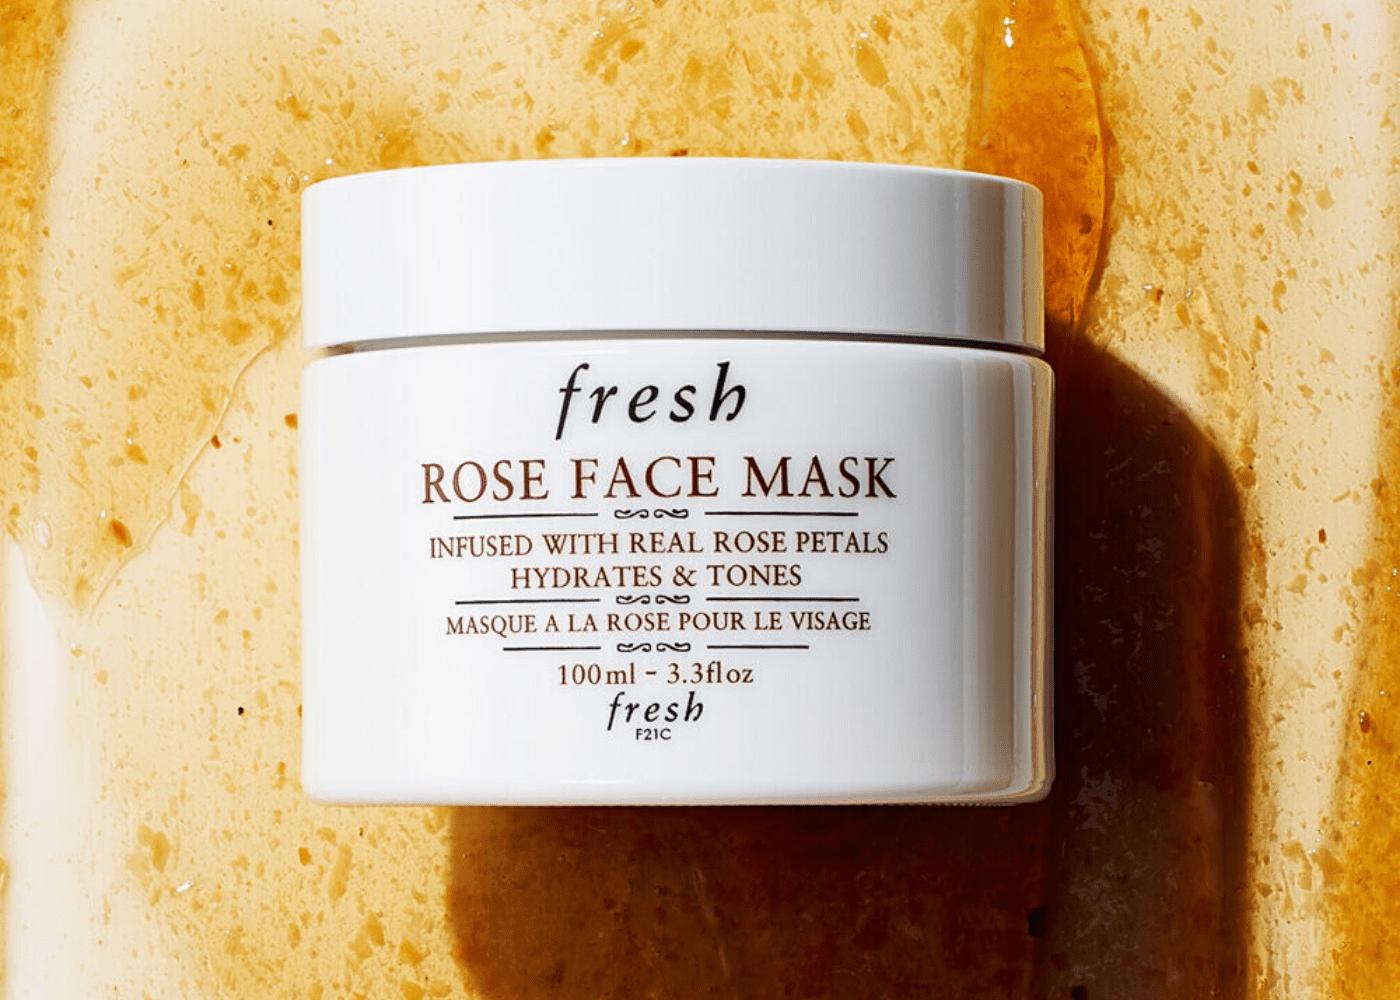 Fresh's Rose Face Mask